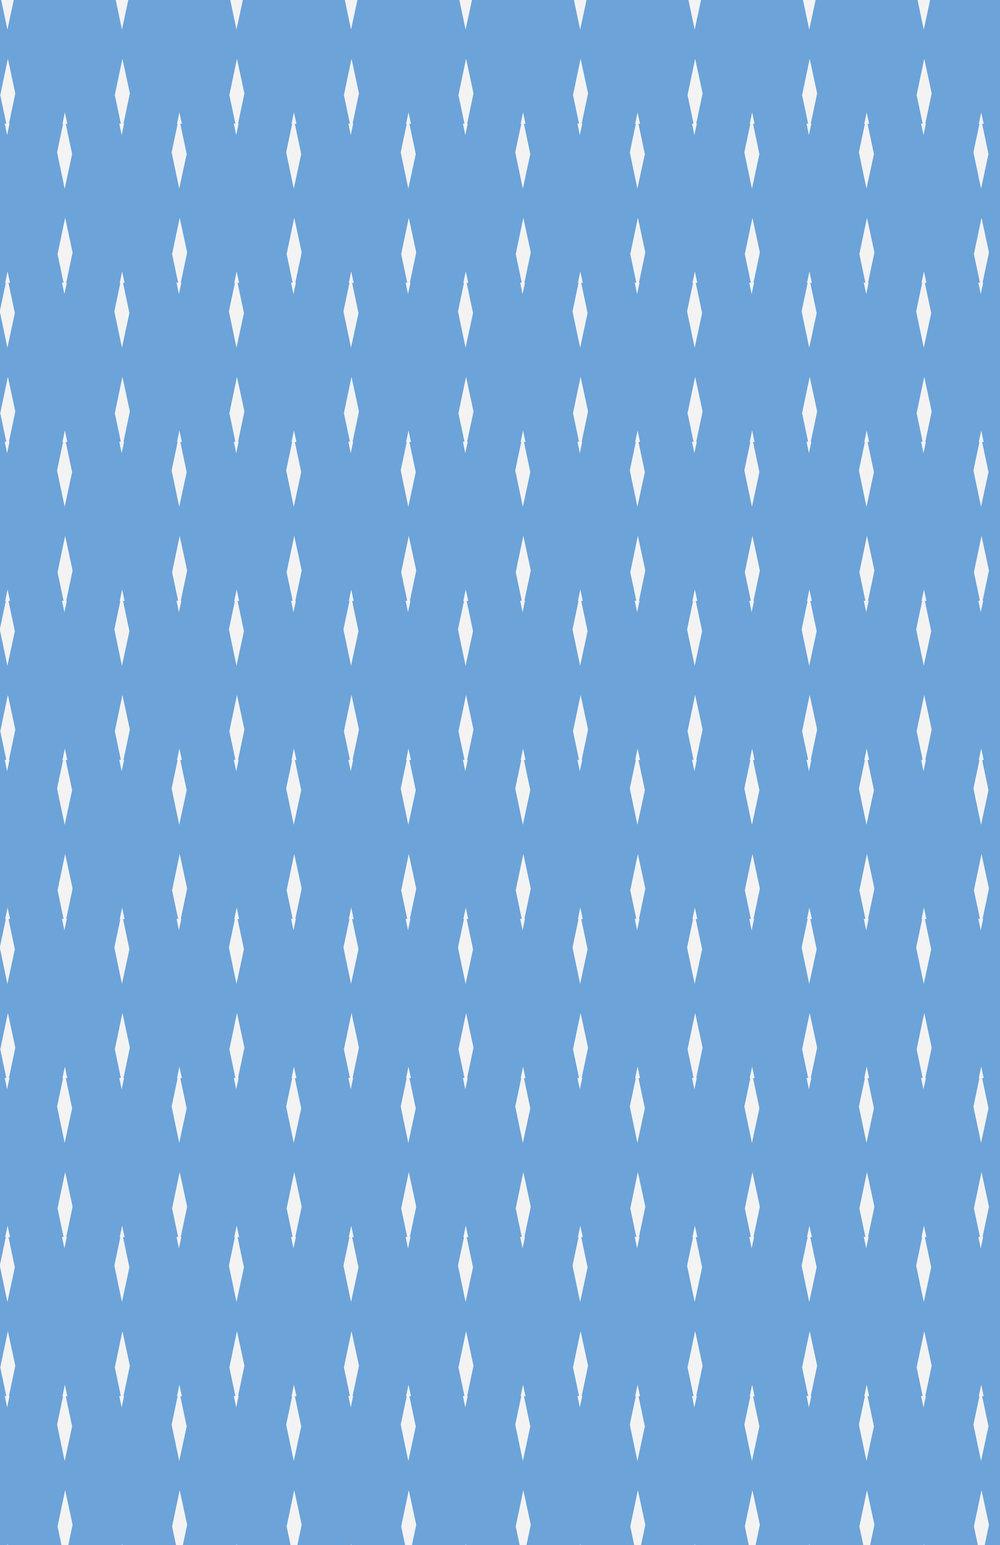 pattern3-04.jpg